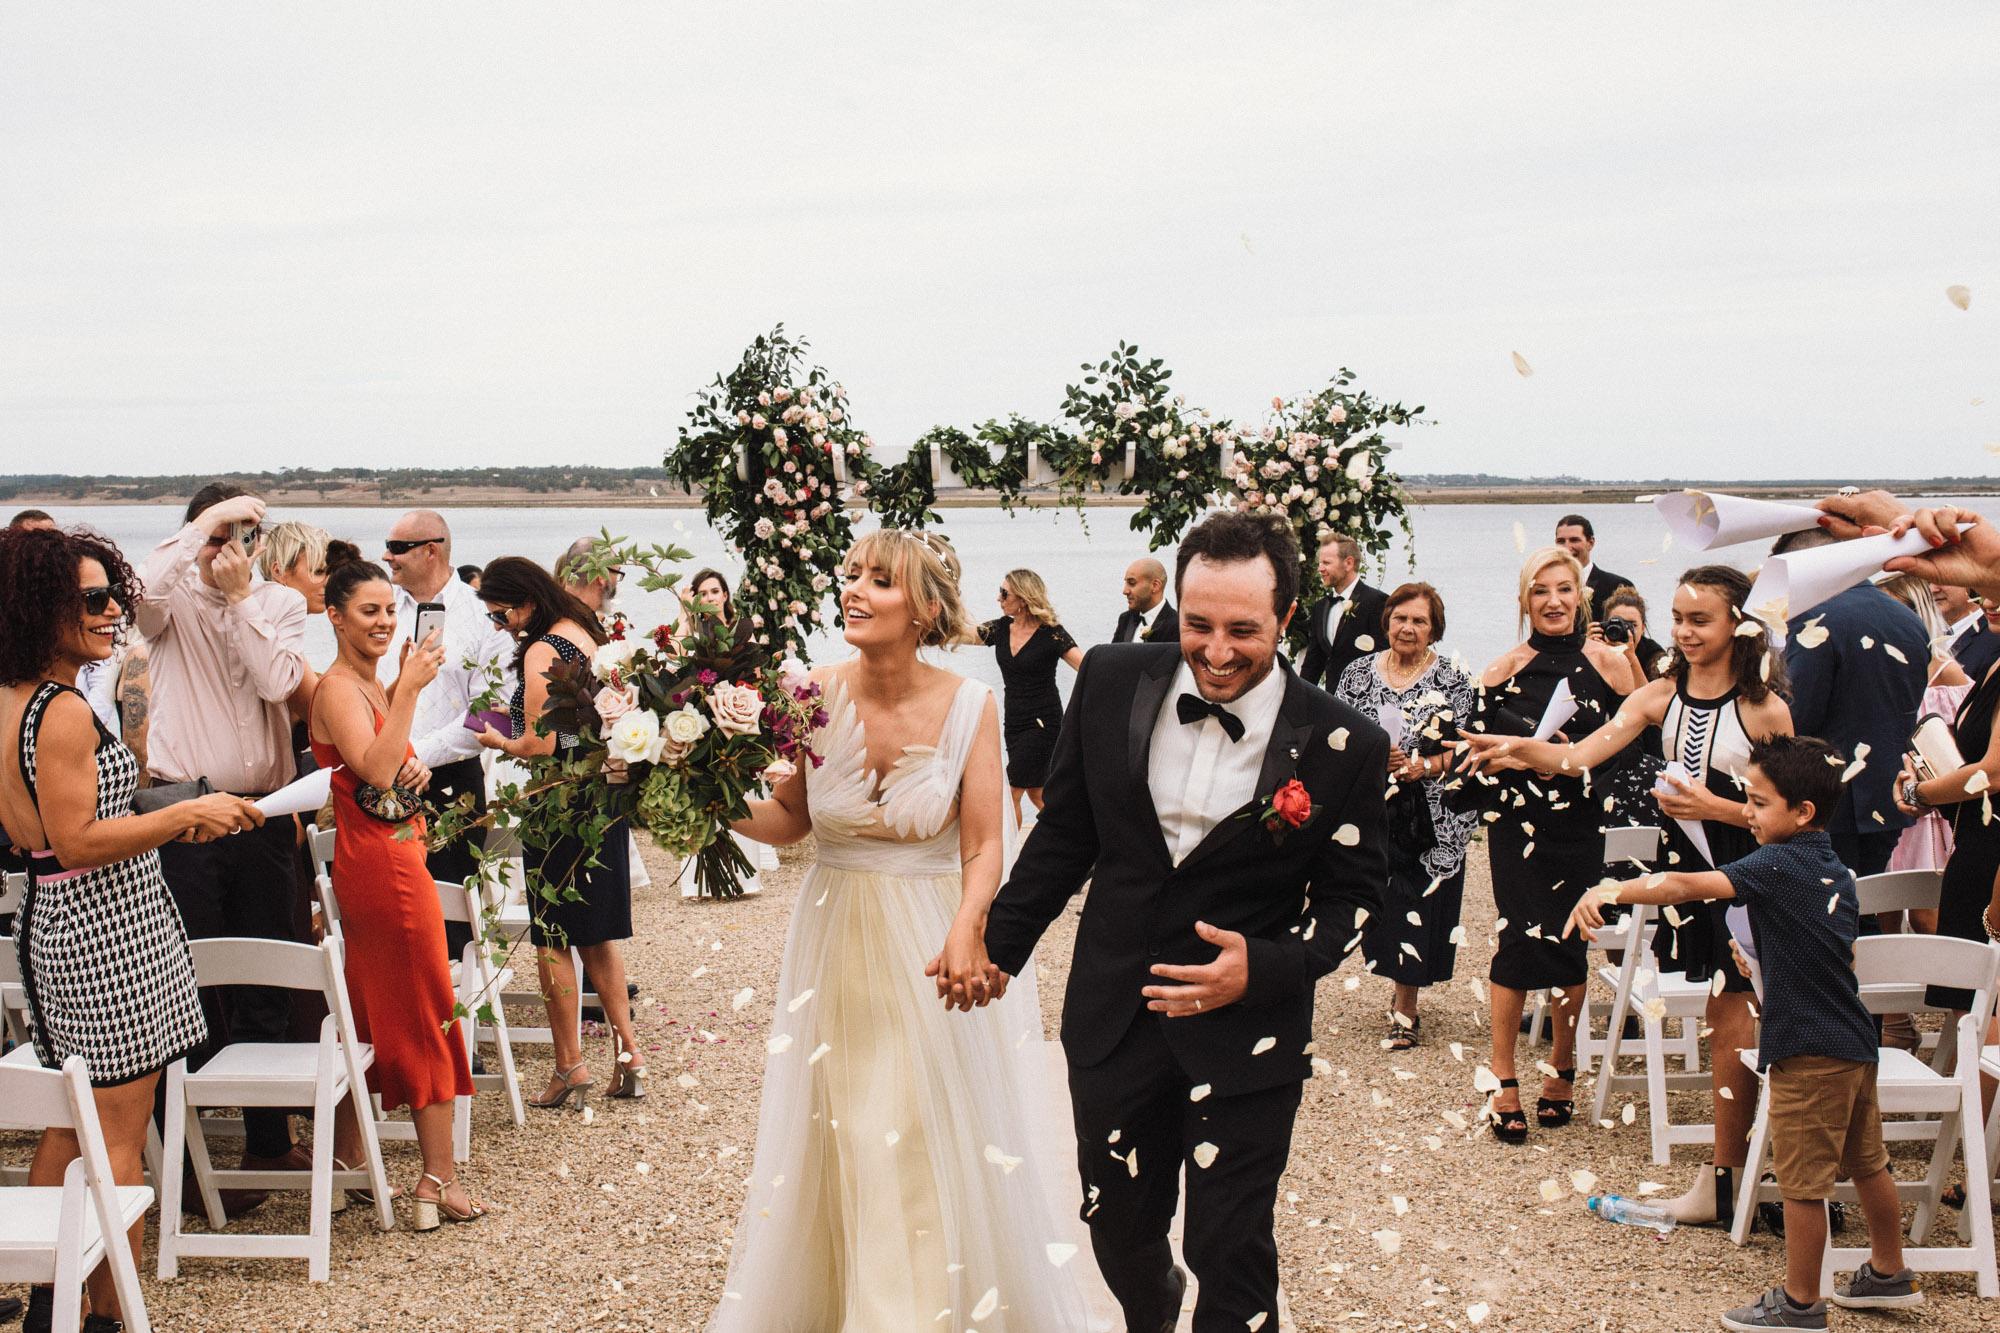 Campbell Point House Wedding HJ + Dean Raphael Weddings-82.jpg